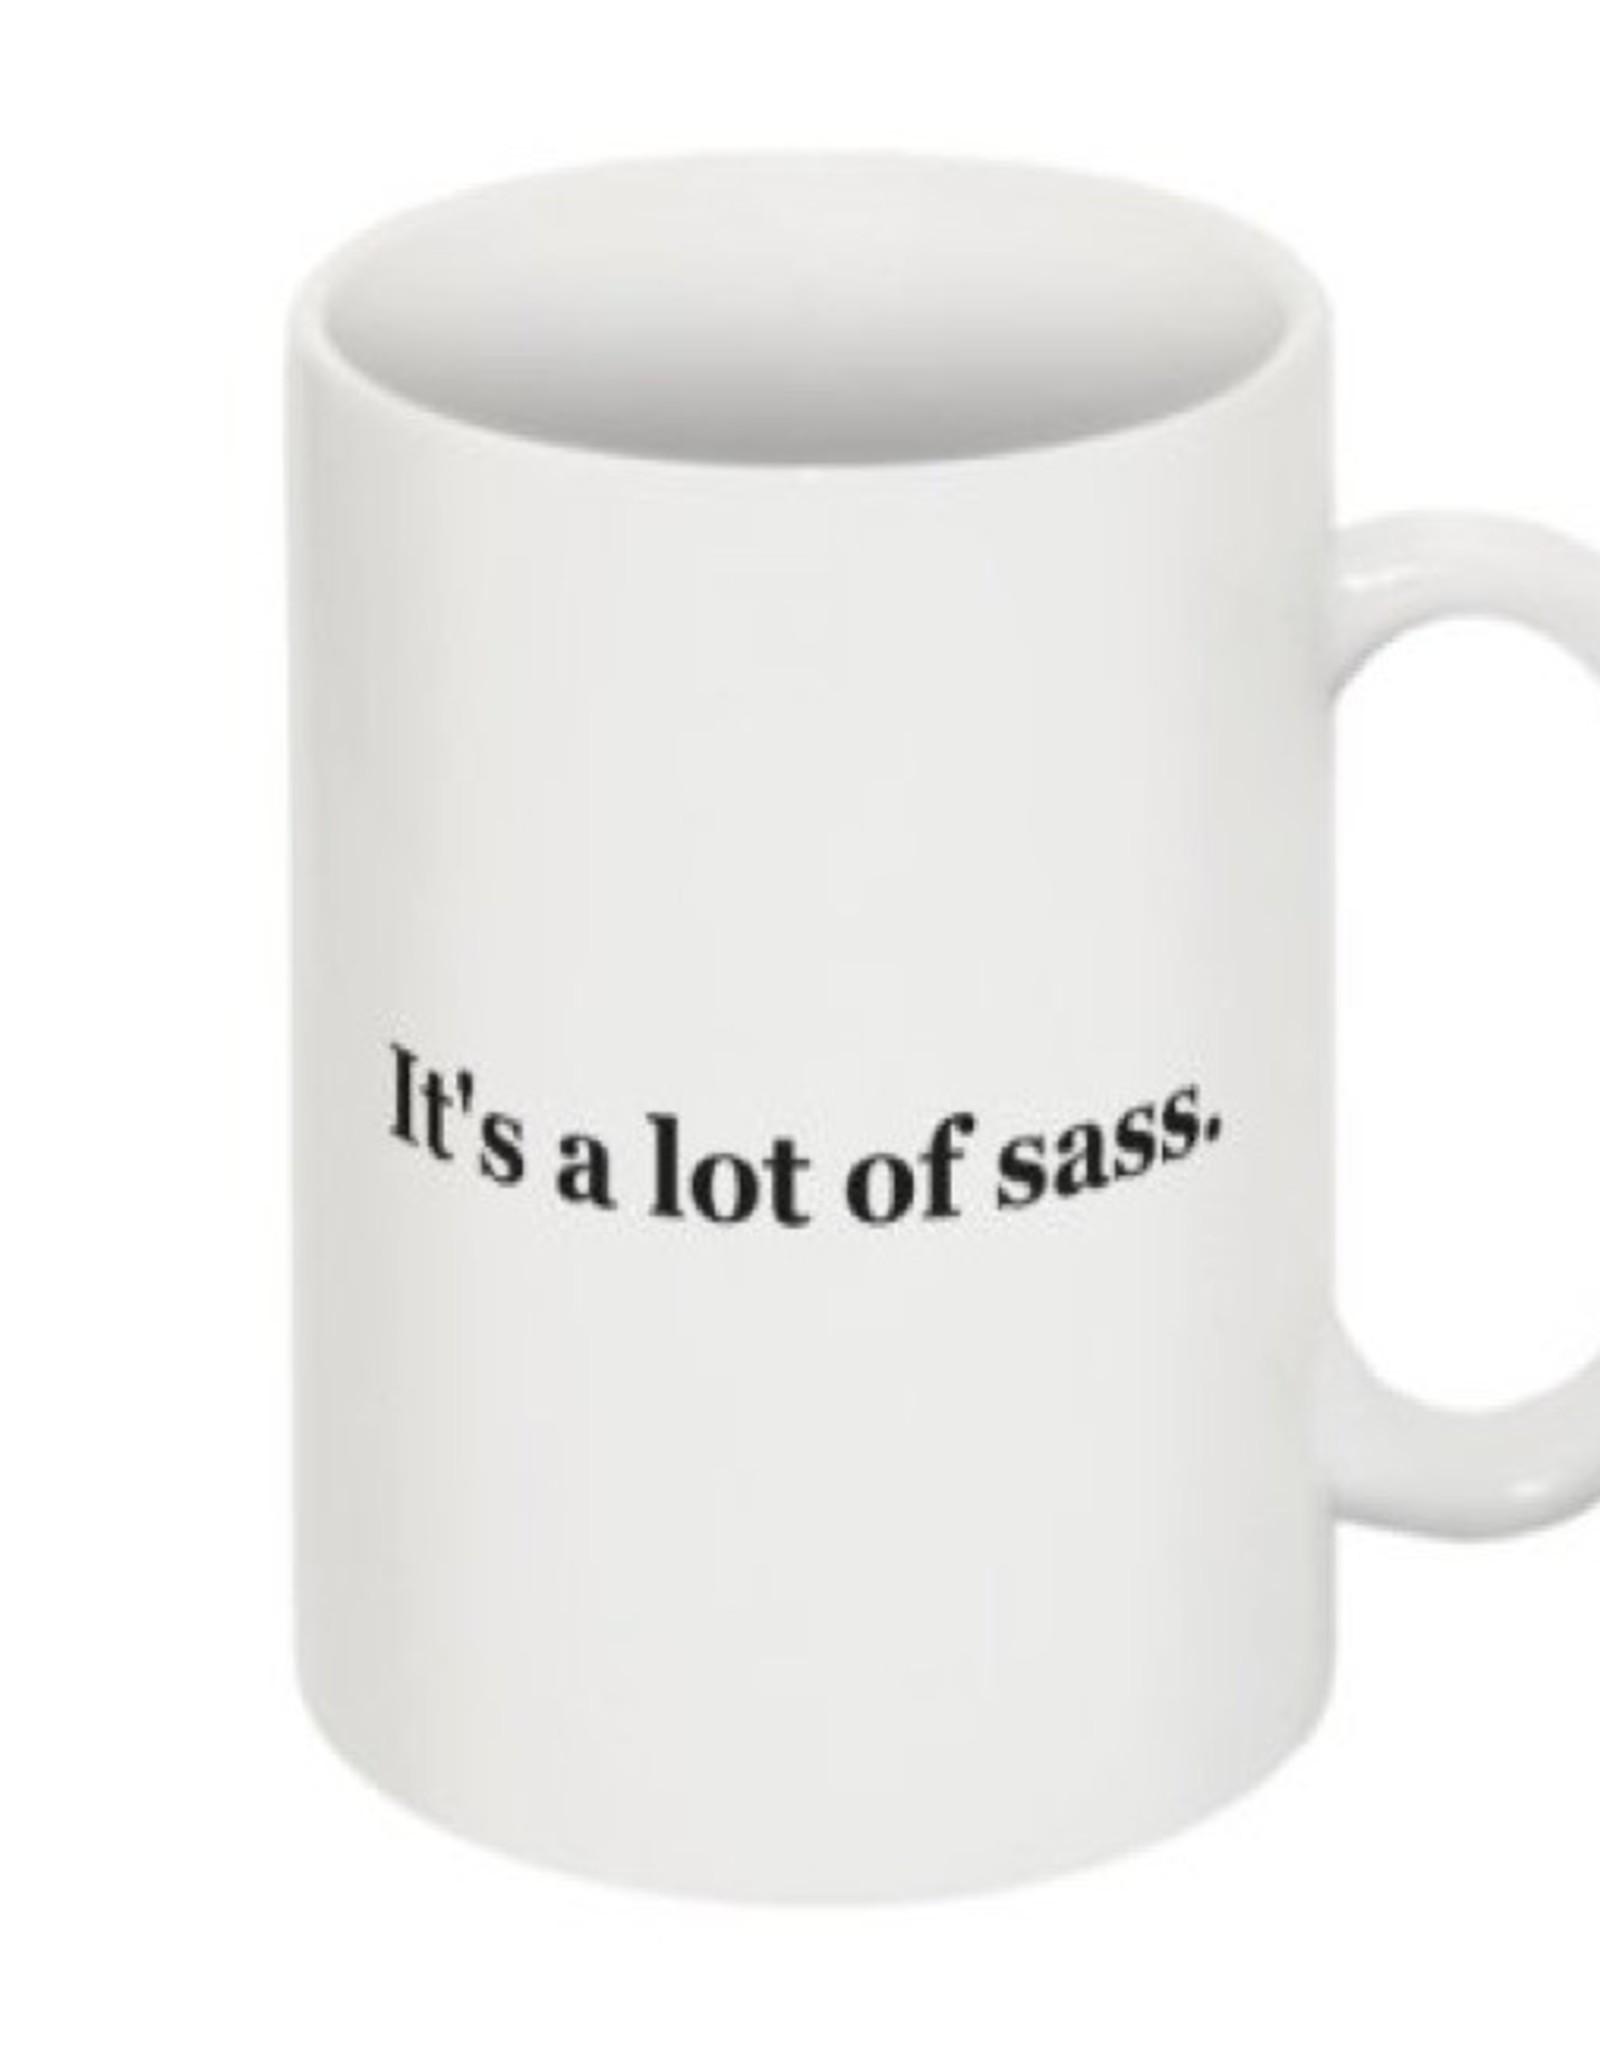 Mug - Old Town Too Sassy